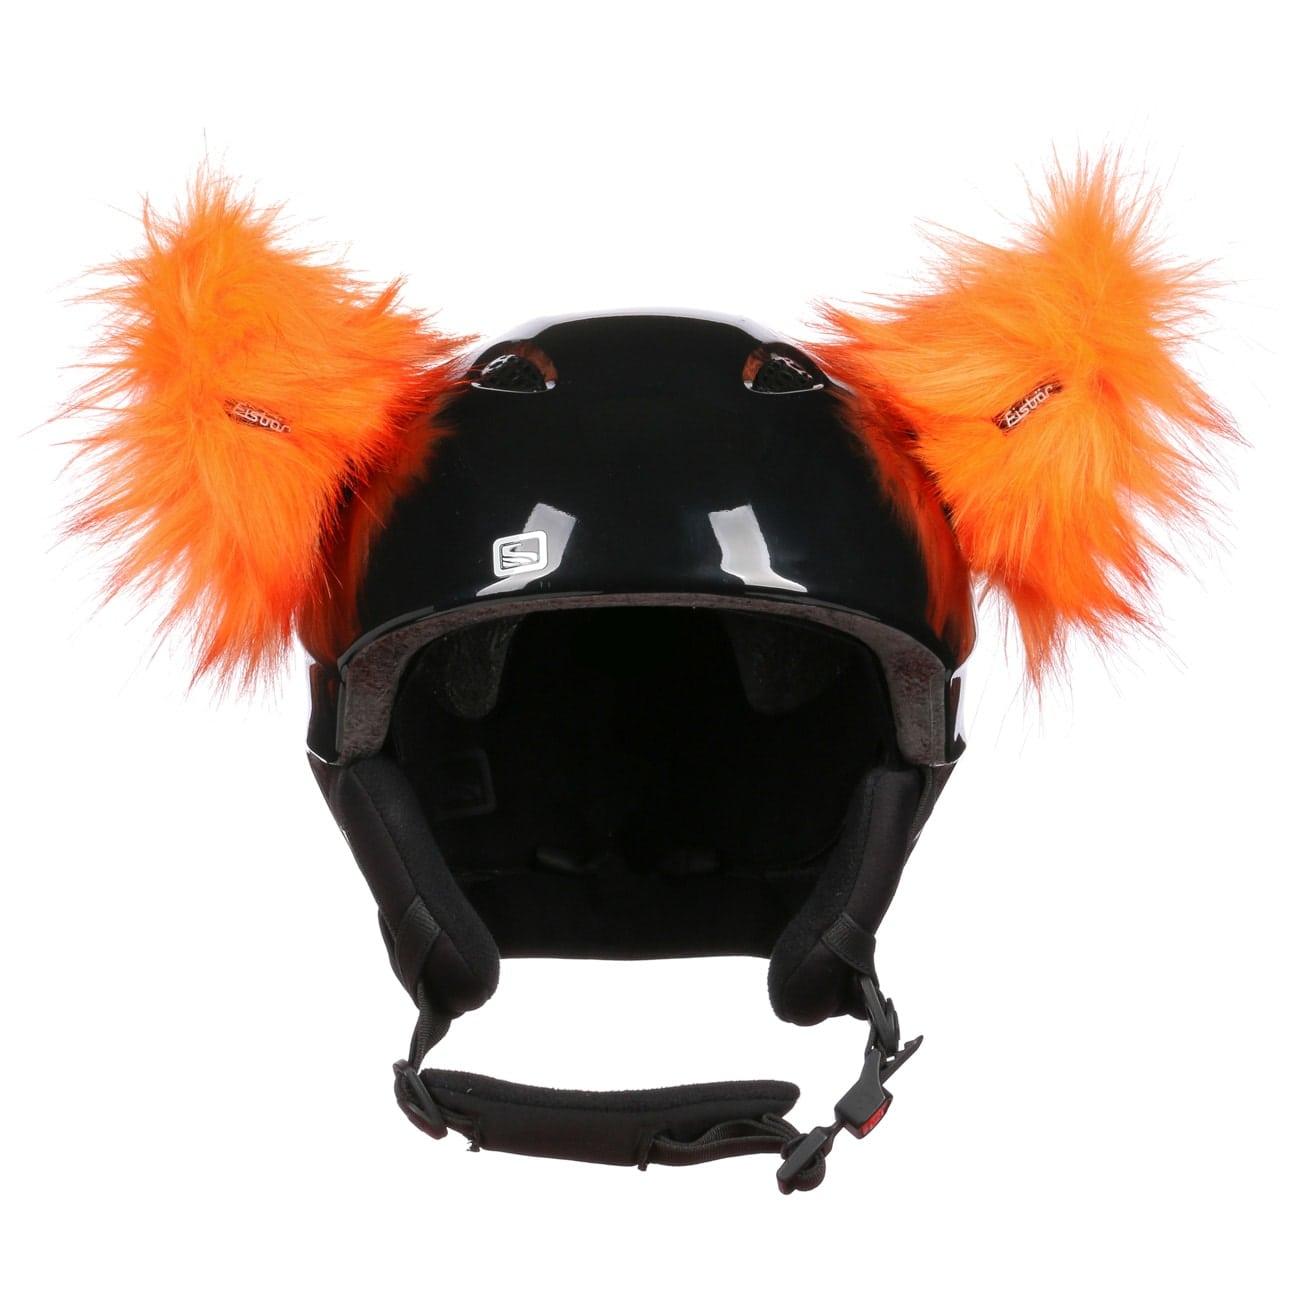 luxury-horns-helmaufkleber-by-eisbar, 29.99 EUR @ hutshopping-de